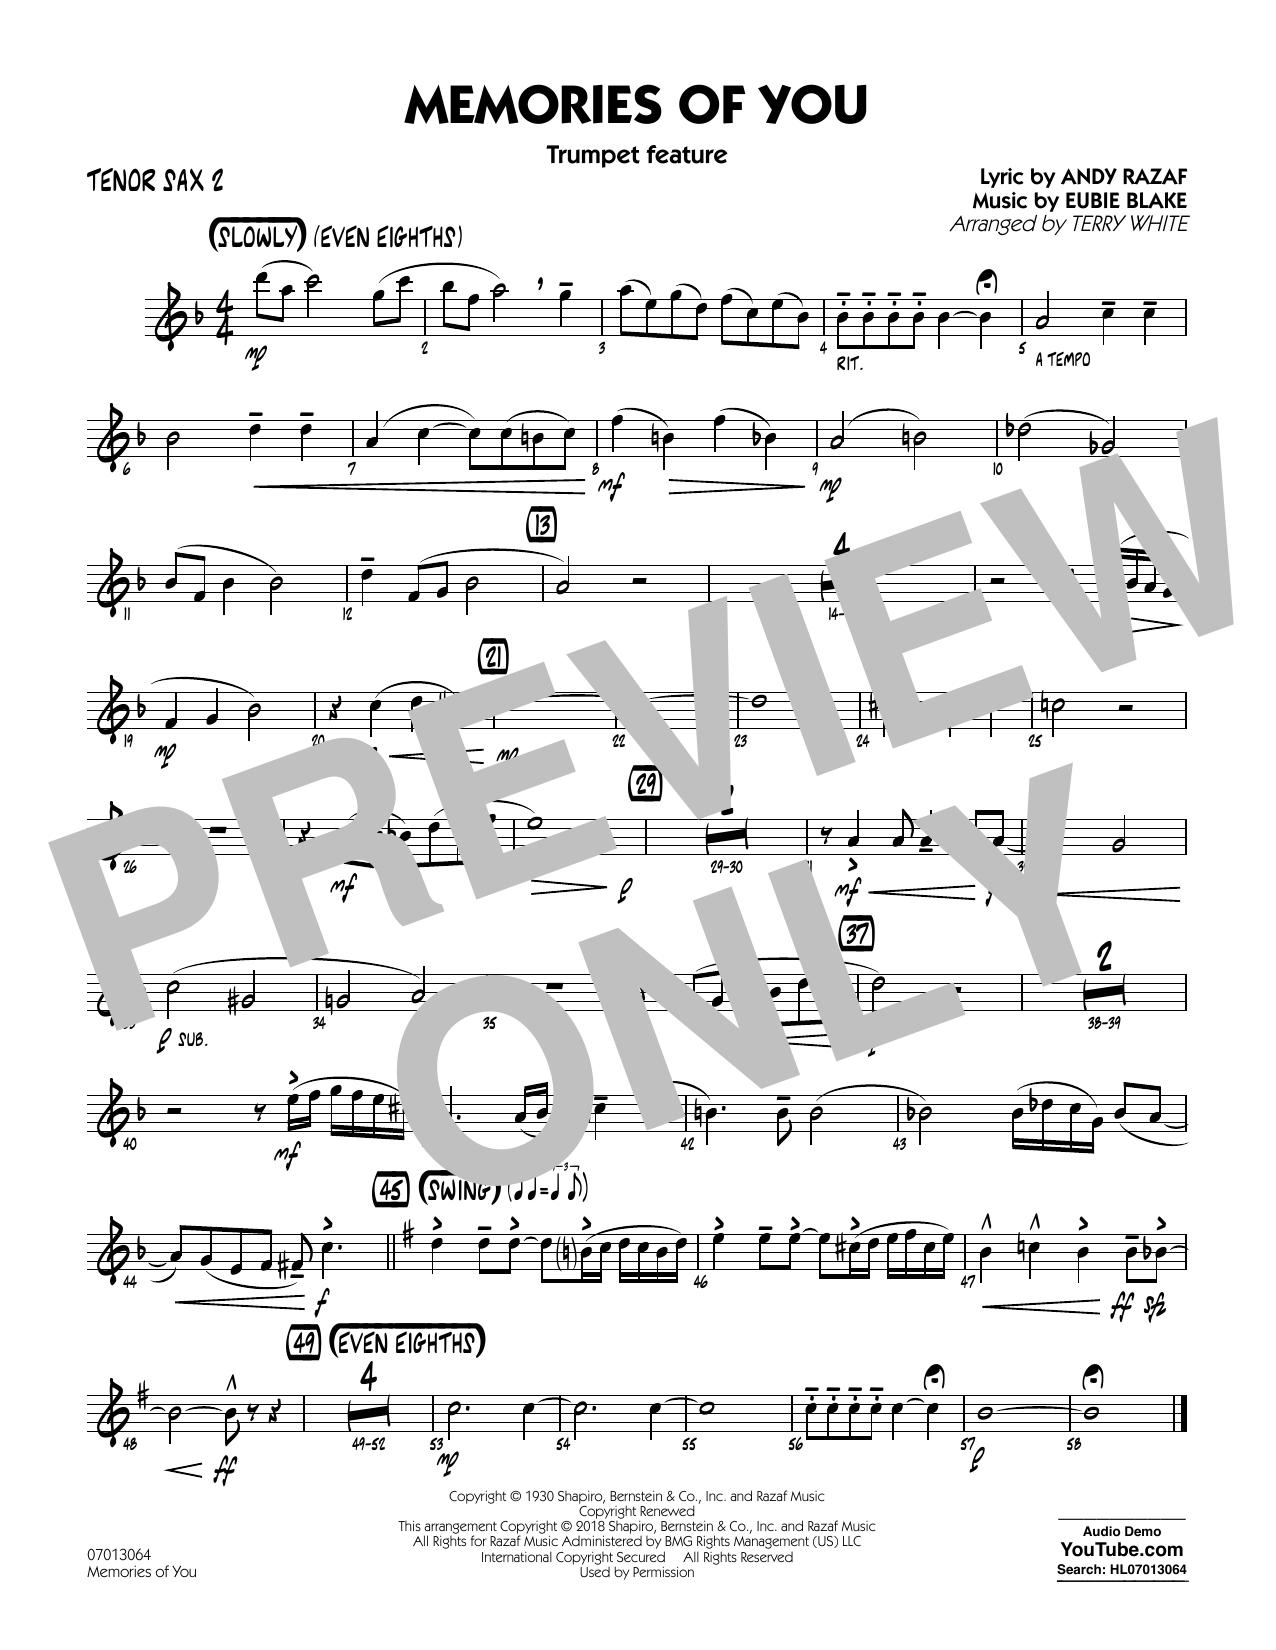 Terry White Memories of You (Trumpet Feature) - Tenor Sax 2 sheet music notes printable PDF score